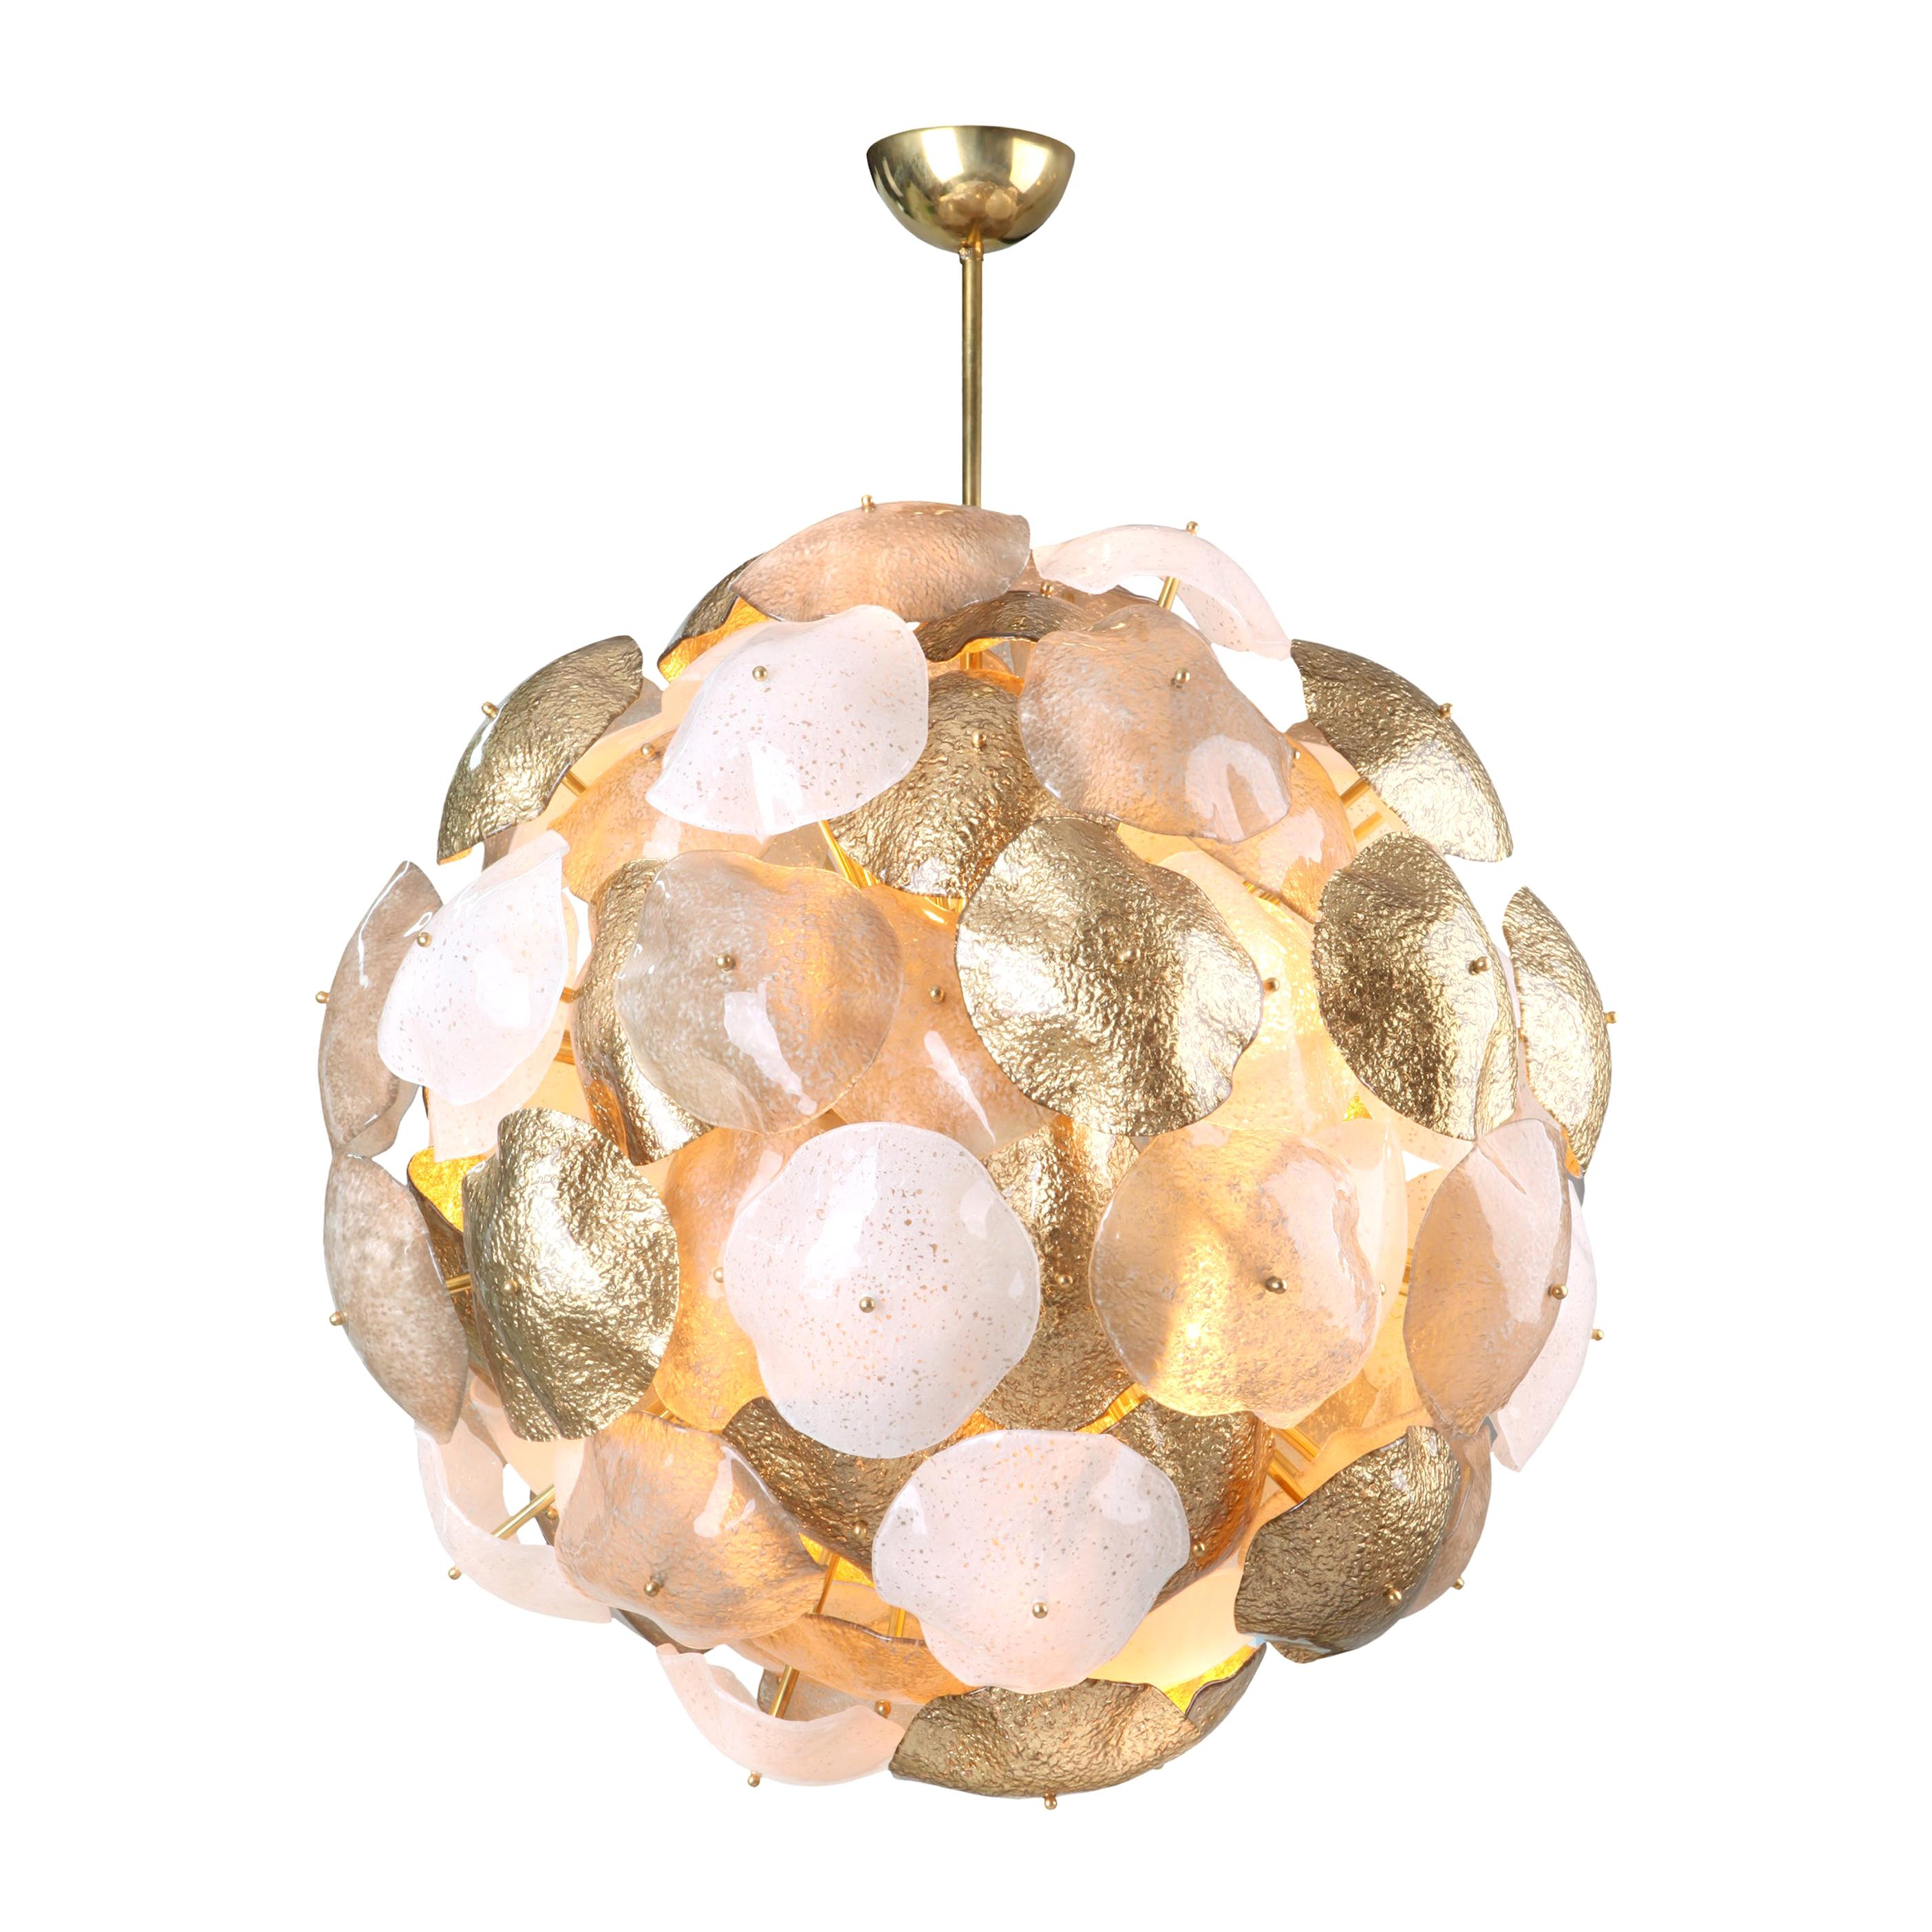 Mare Murano Glass Sputnik Chandelier with 24-Carat Gold Leaf